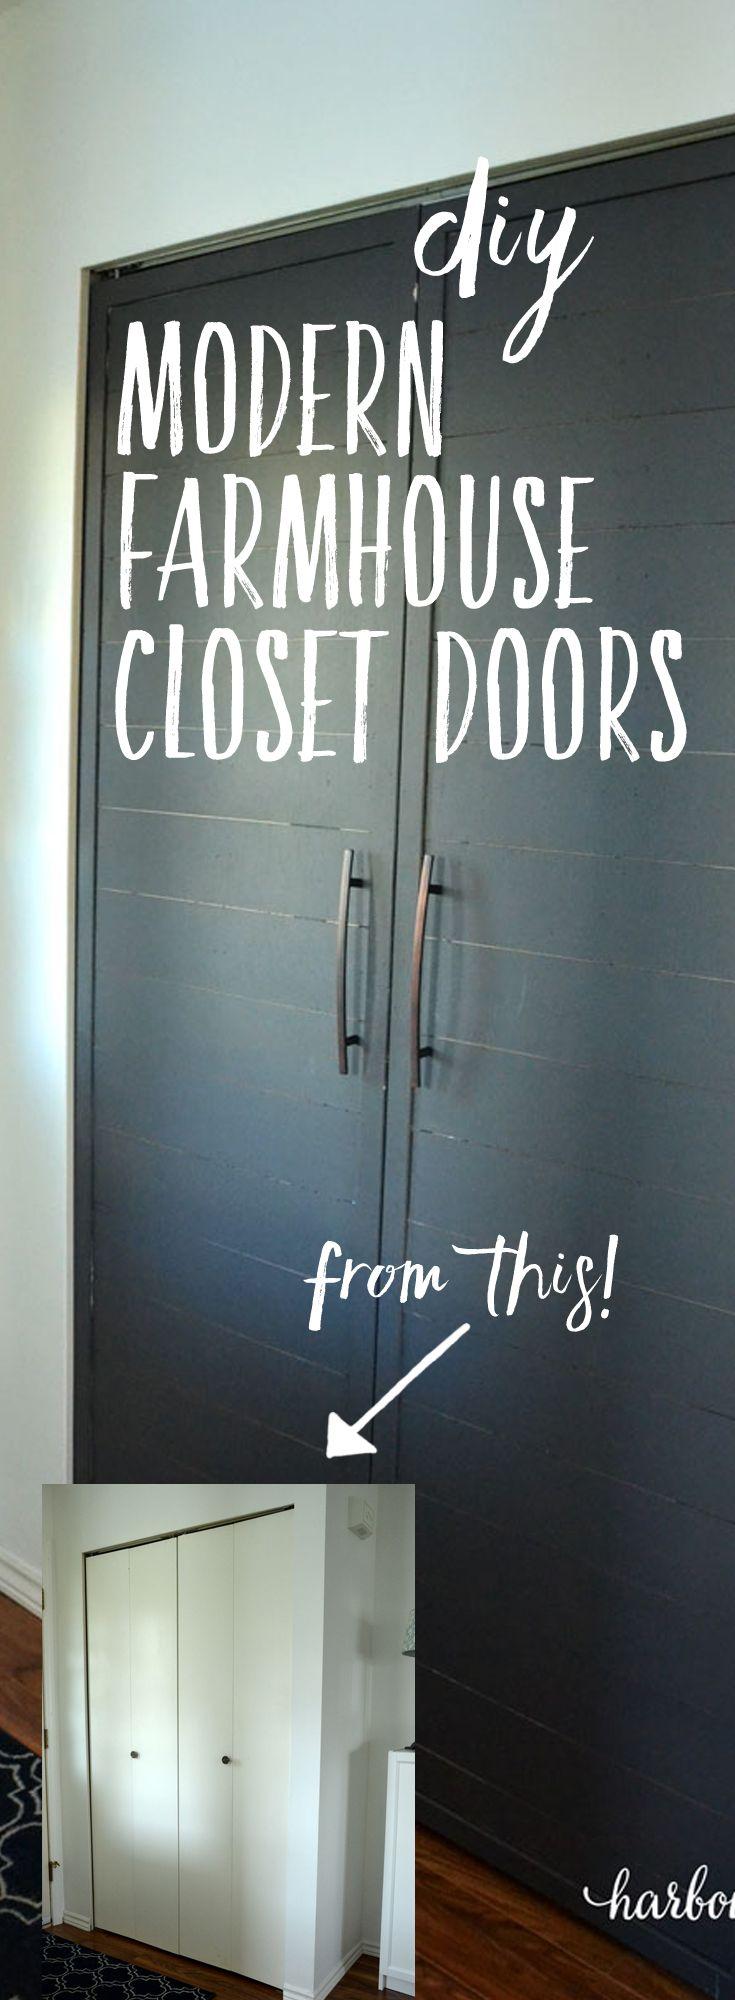 Convert Bi-Fold Closet Doors into French Doors with a Modern Farmhouse Style | diy tutorial